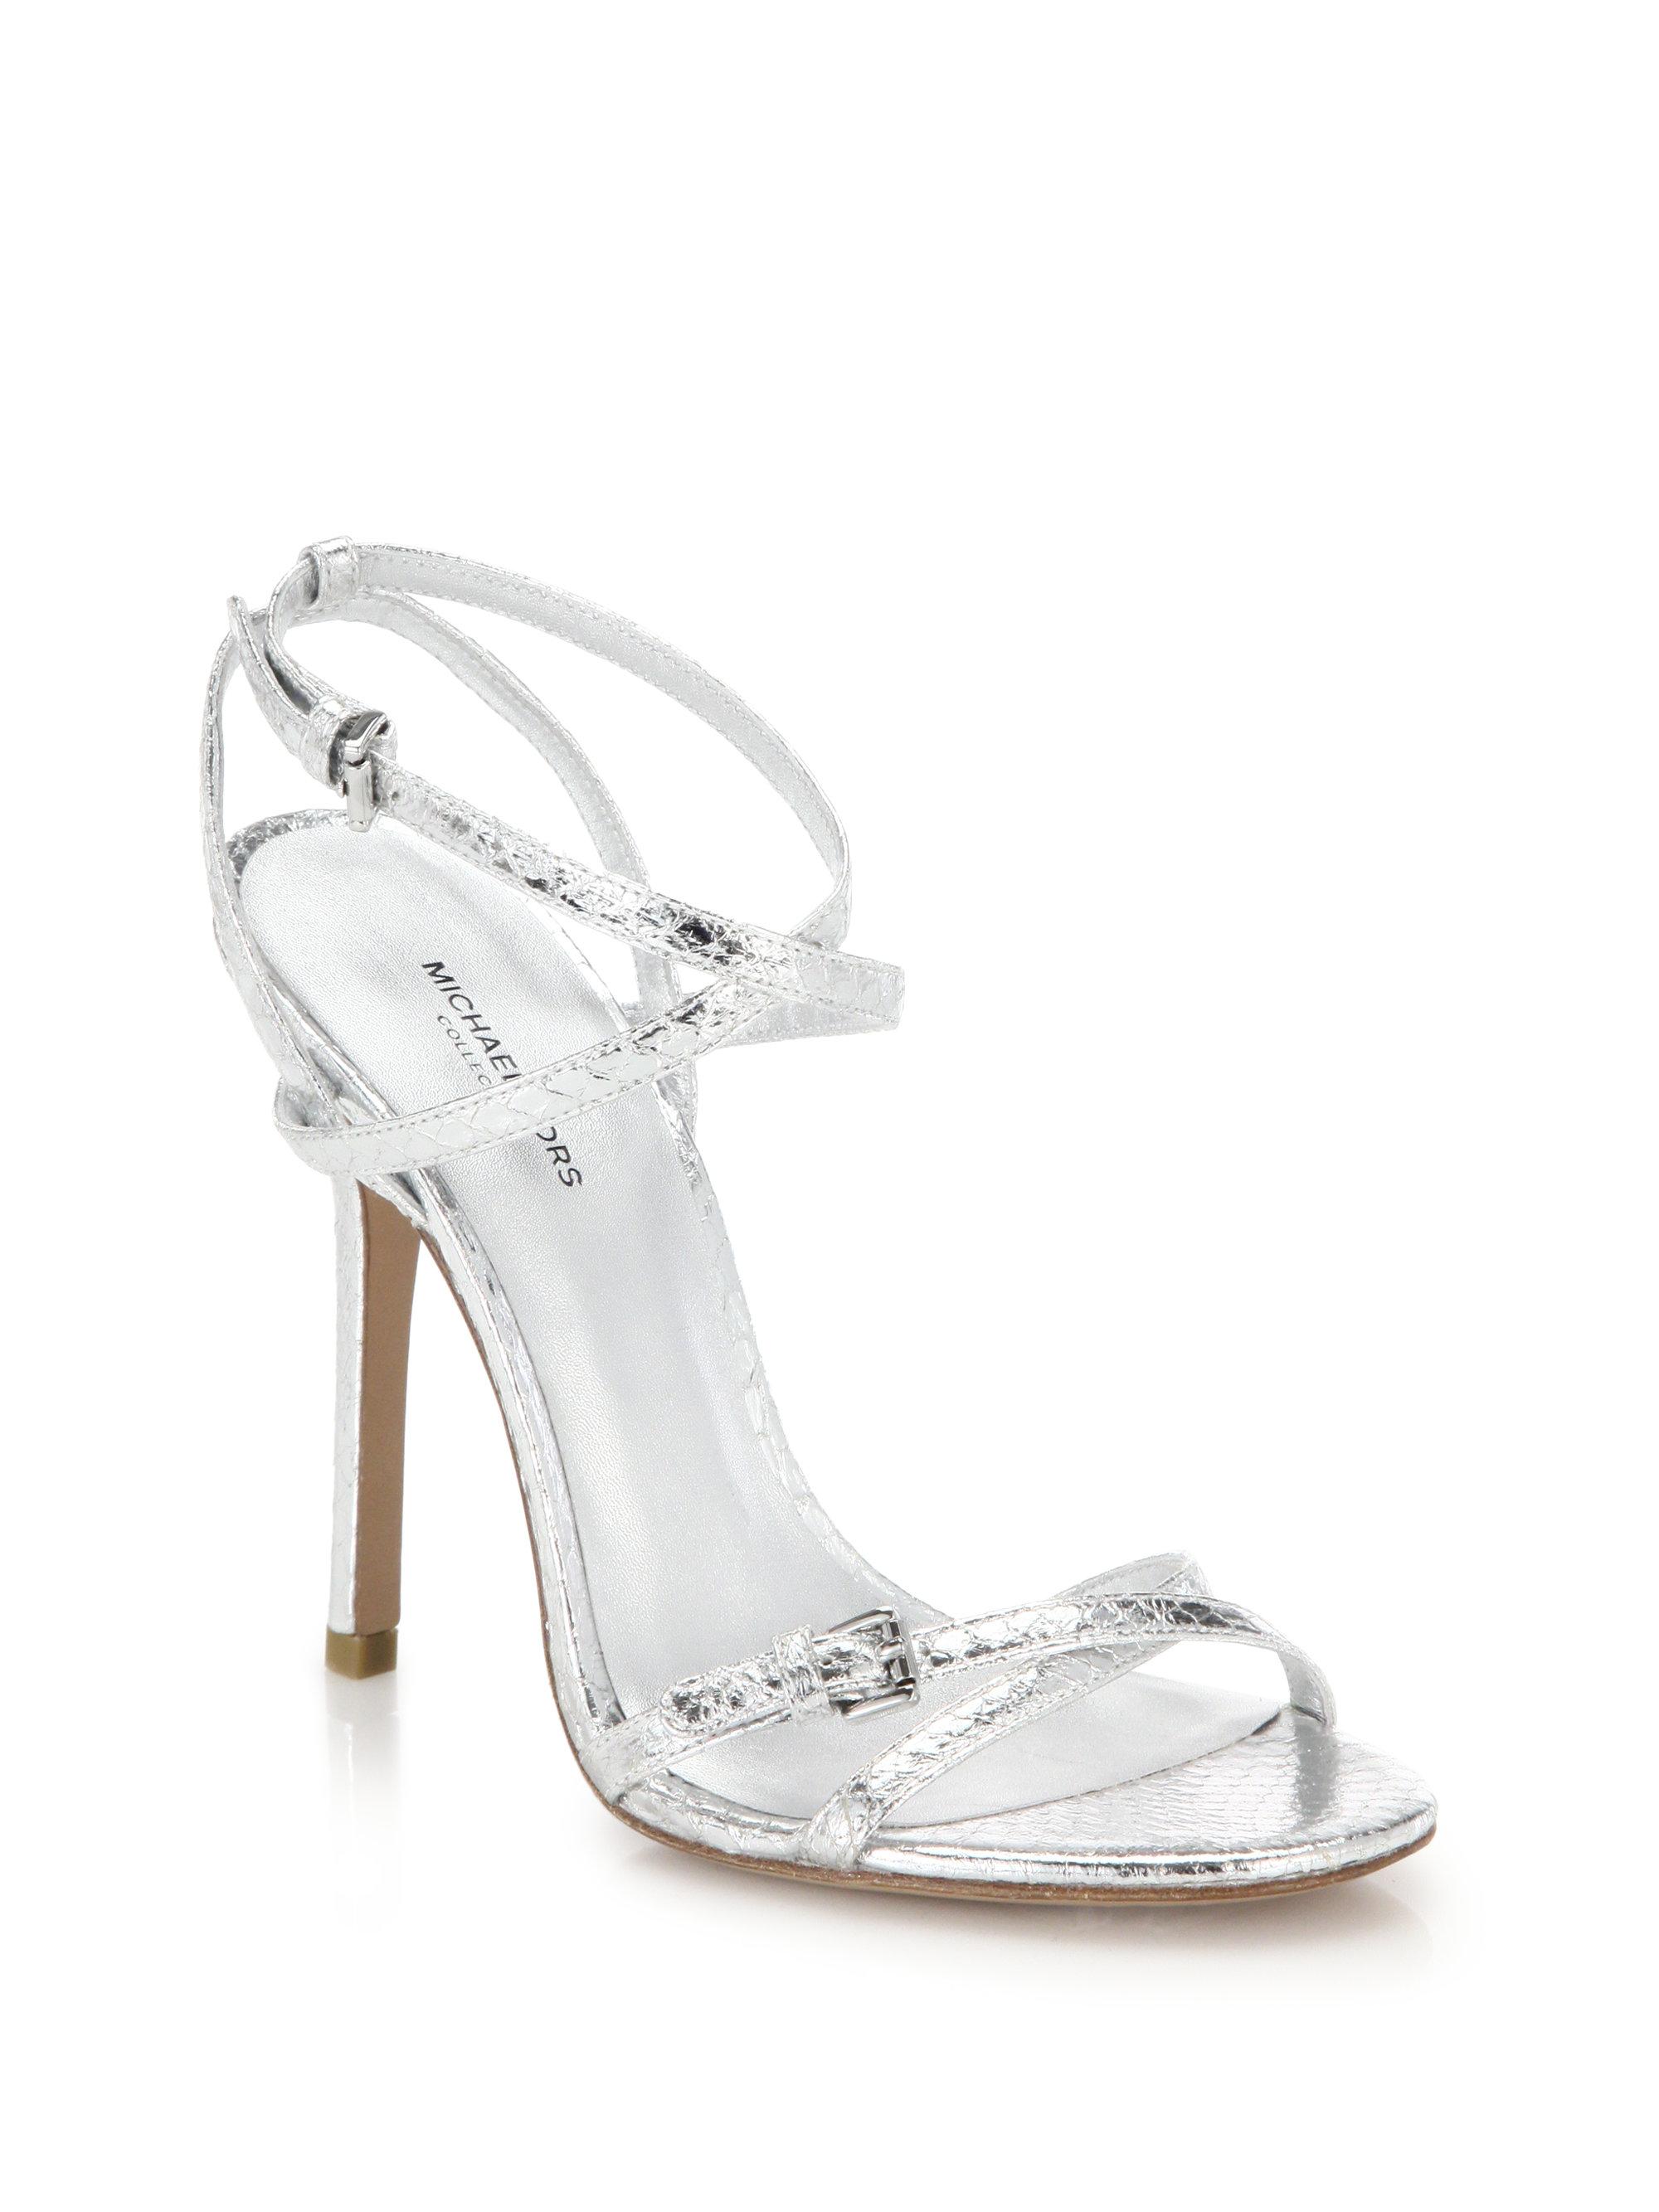 9ee7d161c8cdb Lyst - Michael Kors Jennie Metallic Leather Sandals in Metallic